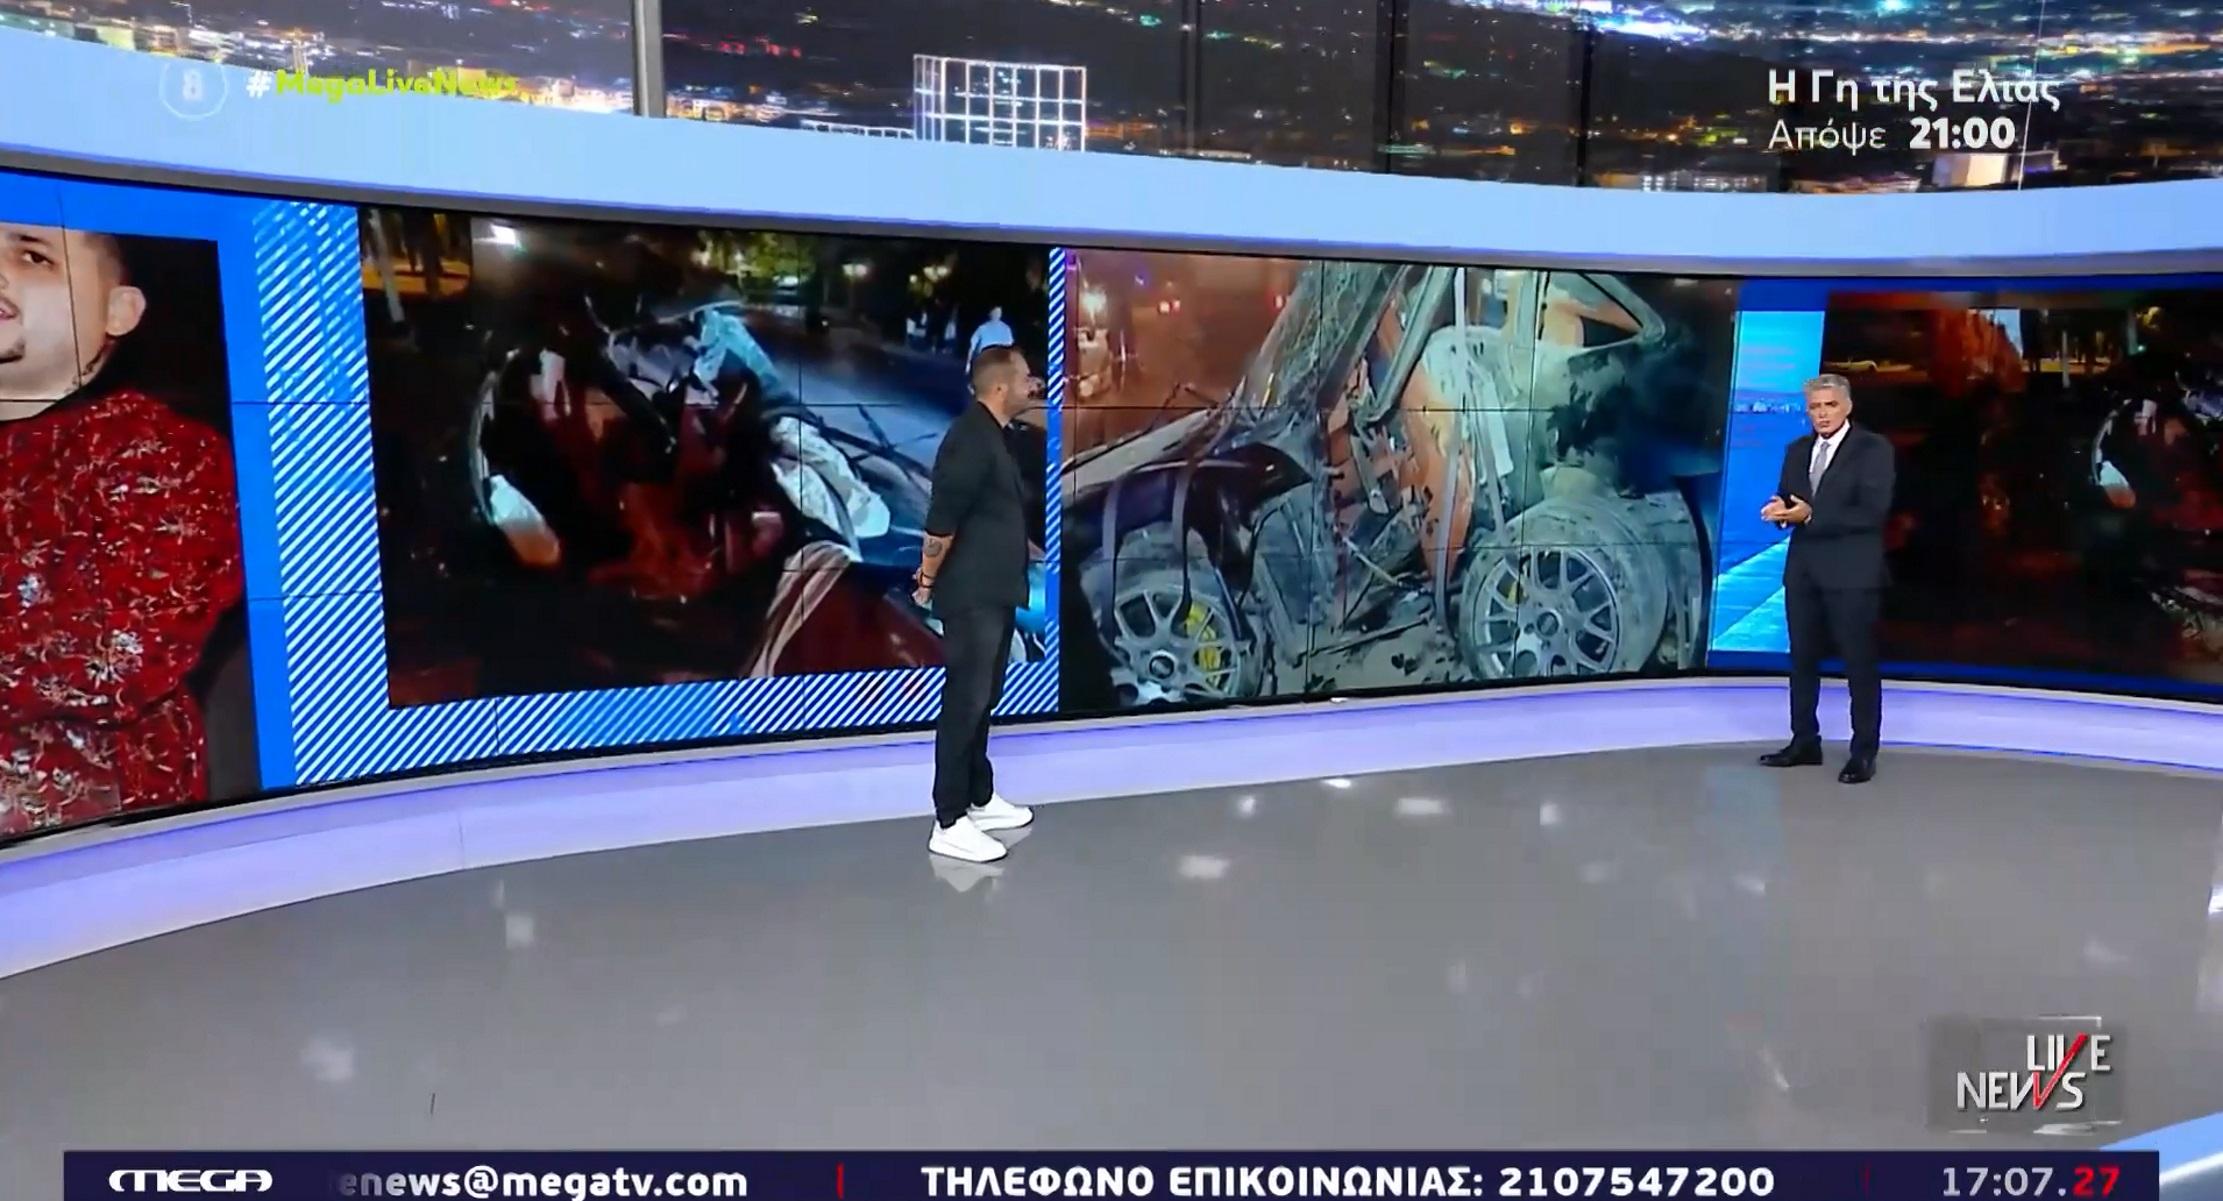 Mad Clip – Αντώνης Δημητριάδης στο Live News: Ήμουν λίγα λεπτά πίσω του – Η κολόνα σταμάτησε το αμάξι»